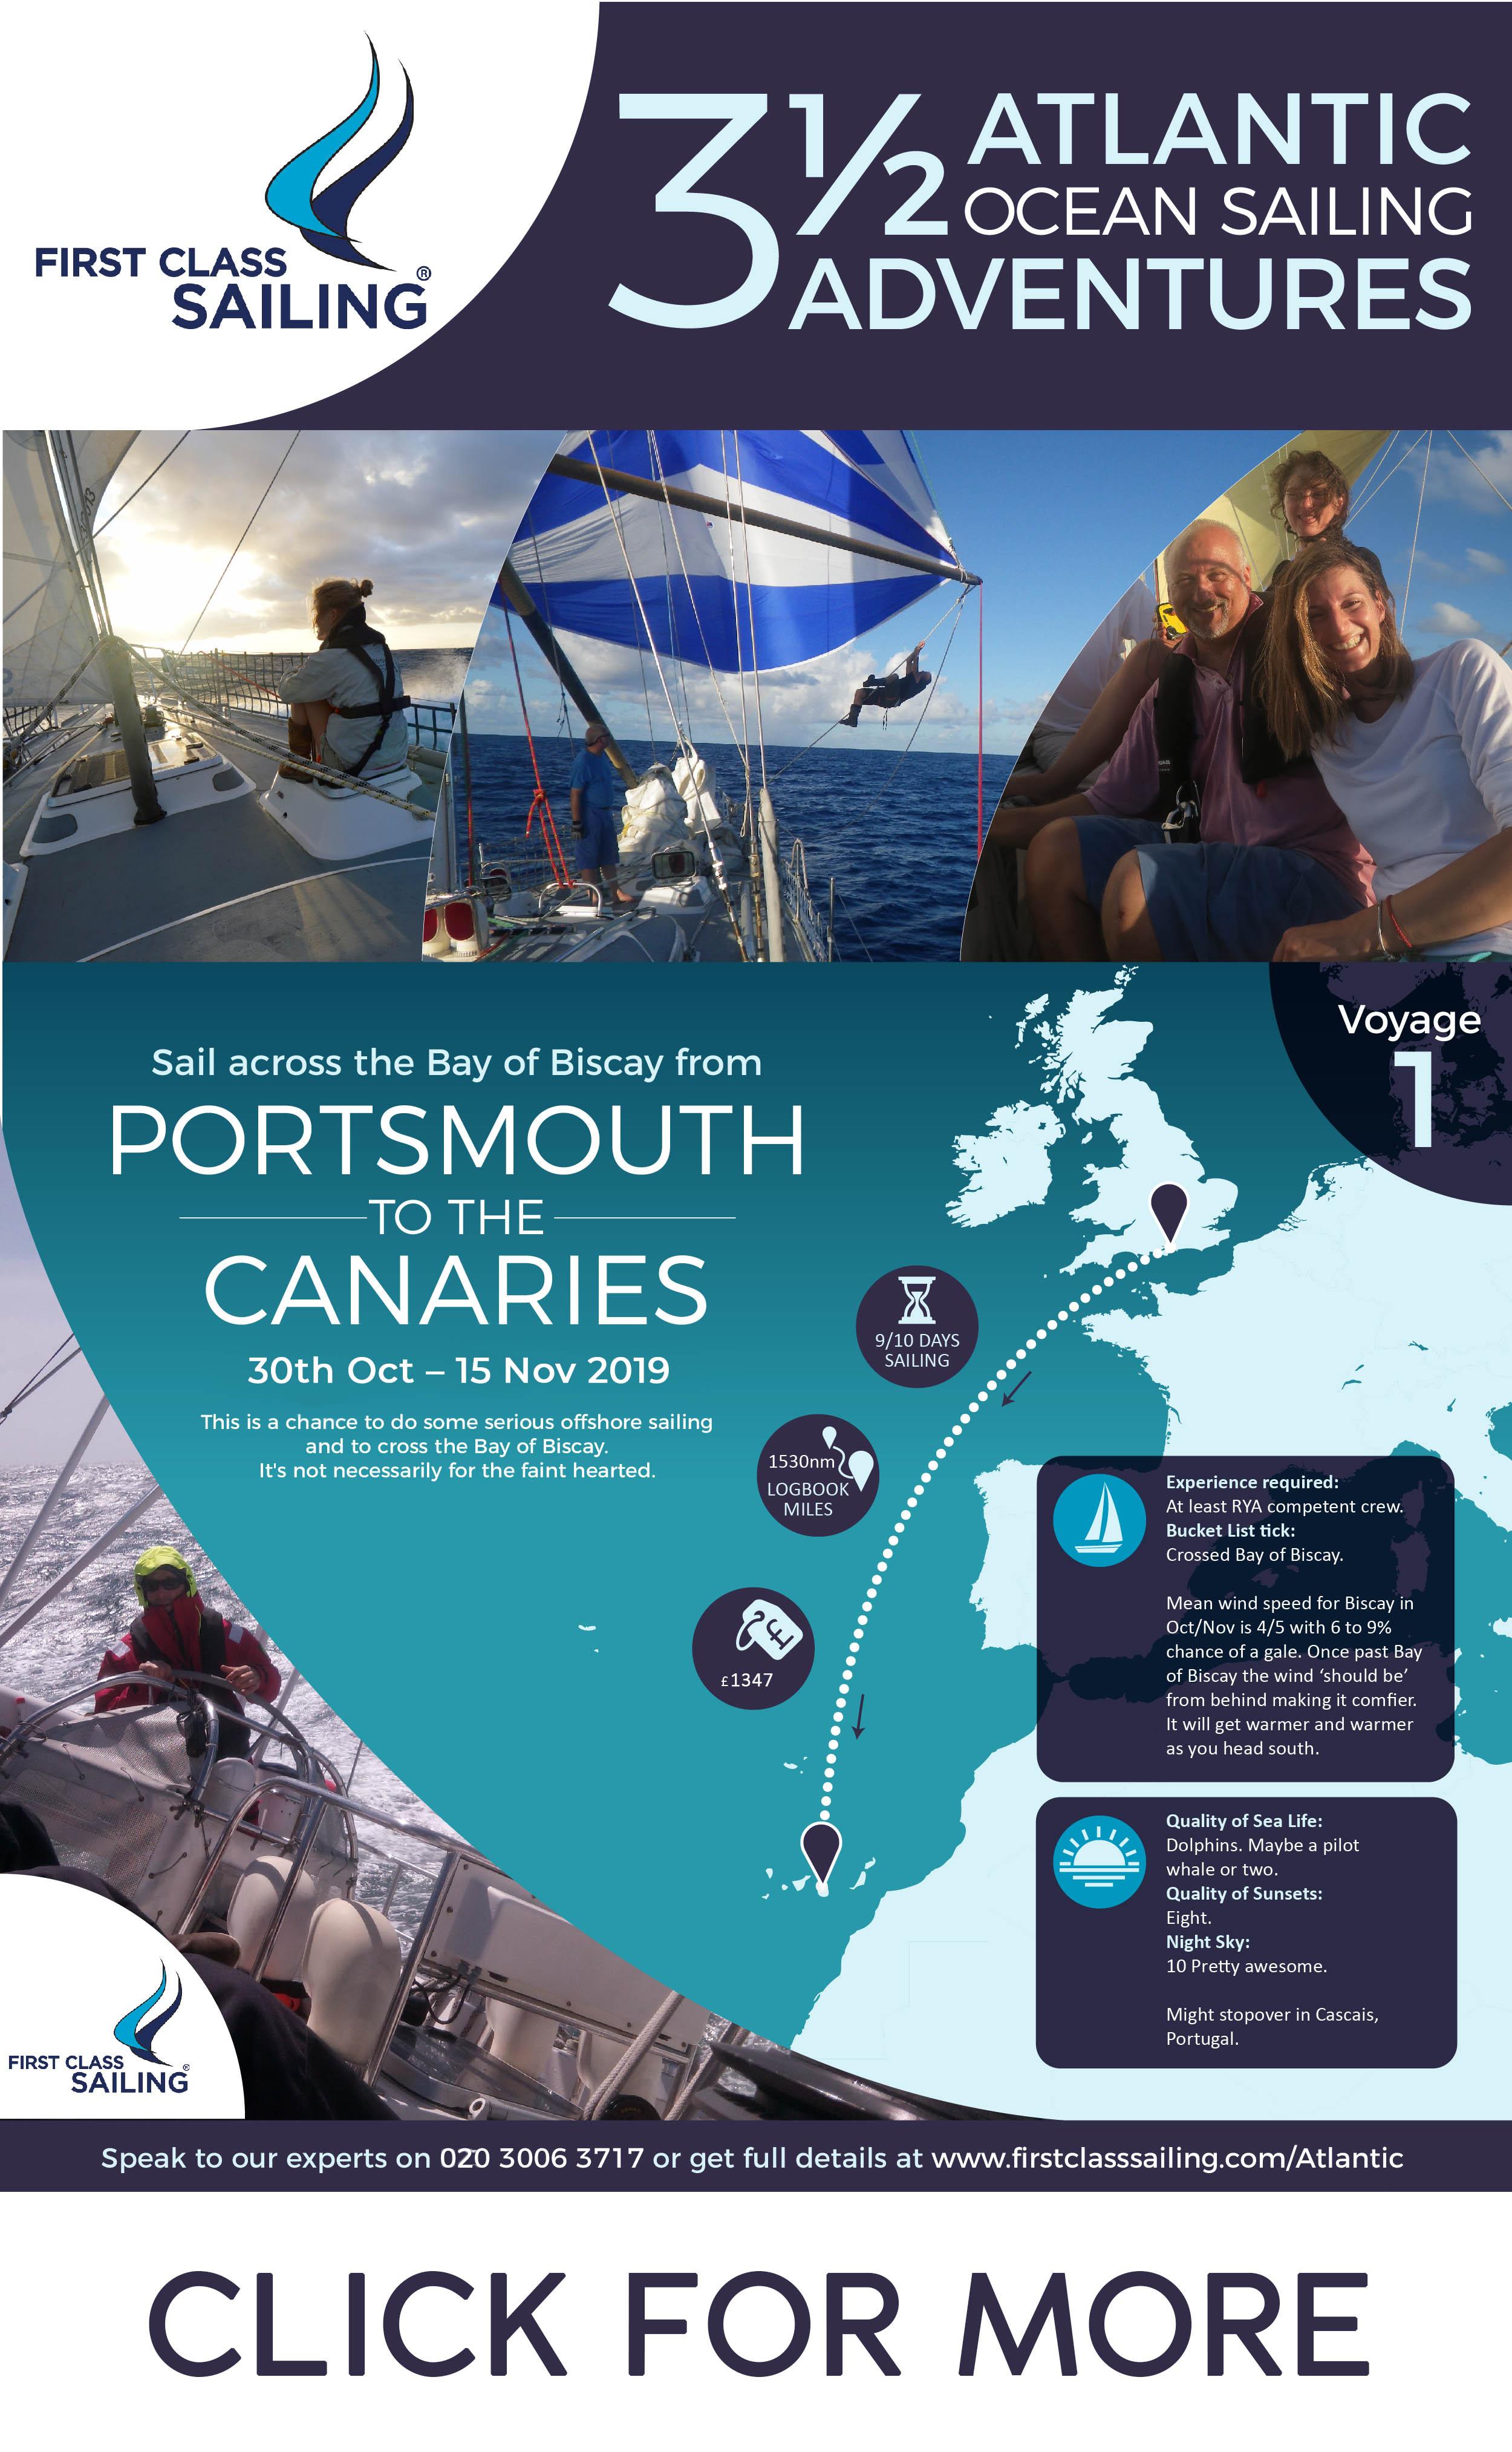 Ocean Challenge Atlantic Voyages Sailing Infographic